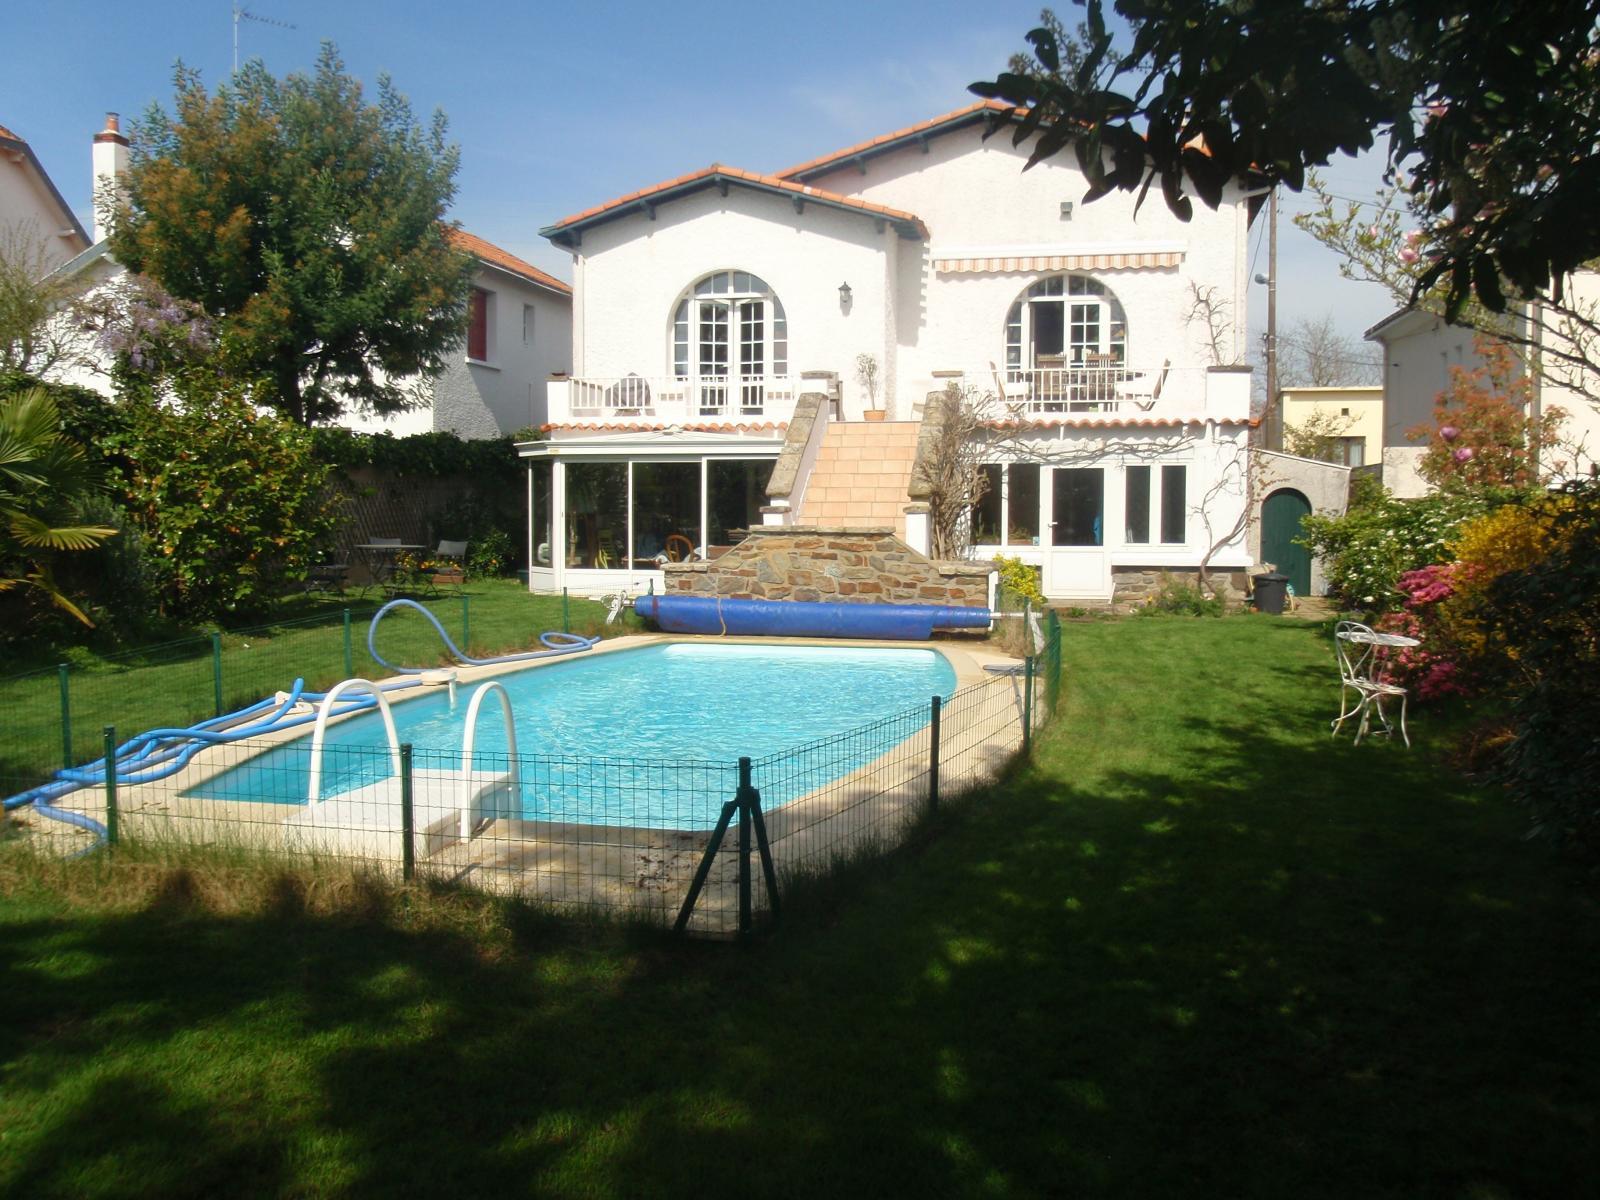 Villa corot nantes 44000 loire atlantique 44 - Maison jardin hornbach nantes ...